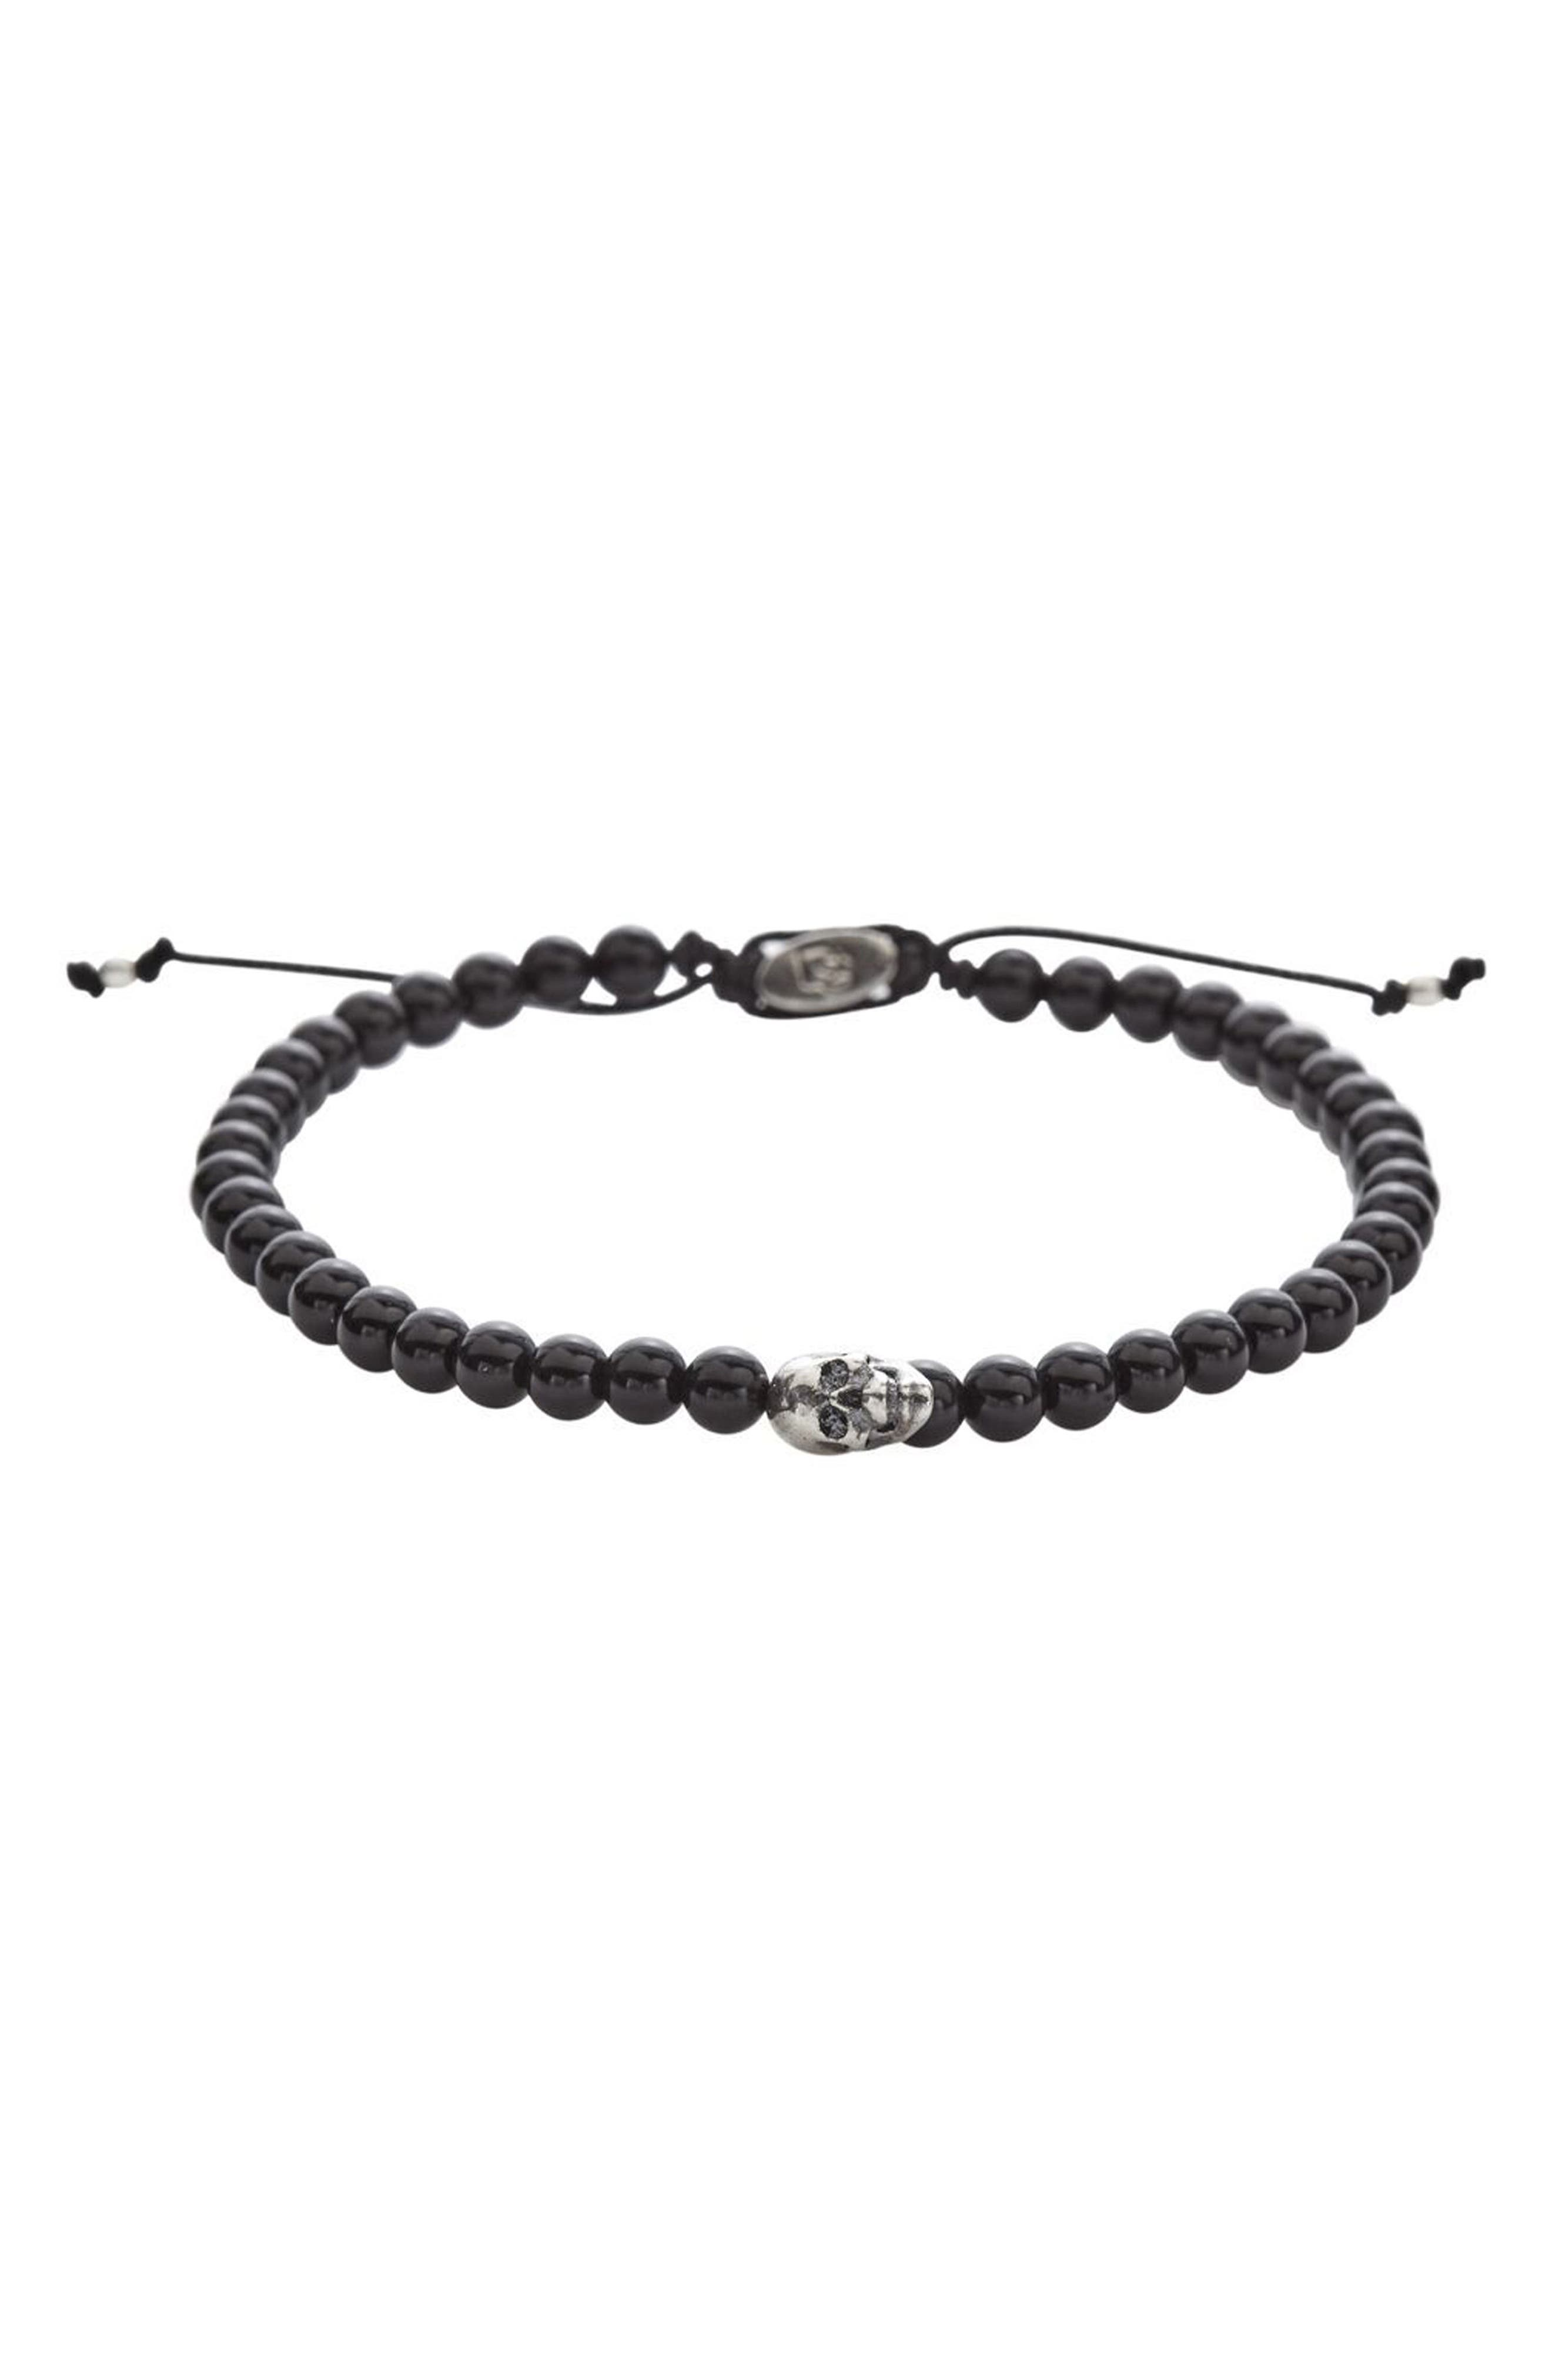 Onyx Bead Bracelet,                             Alternate thumbnail 2, color,                             BLACK